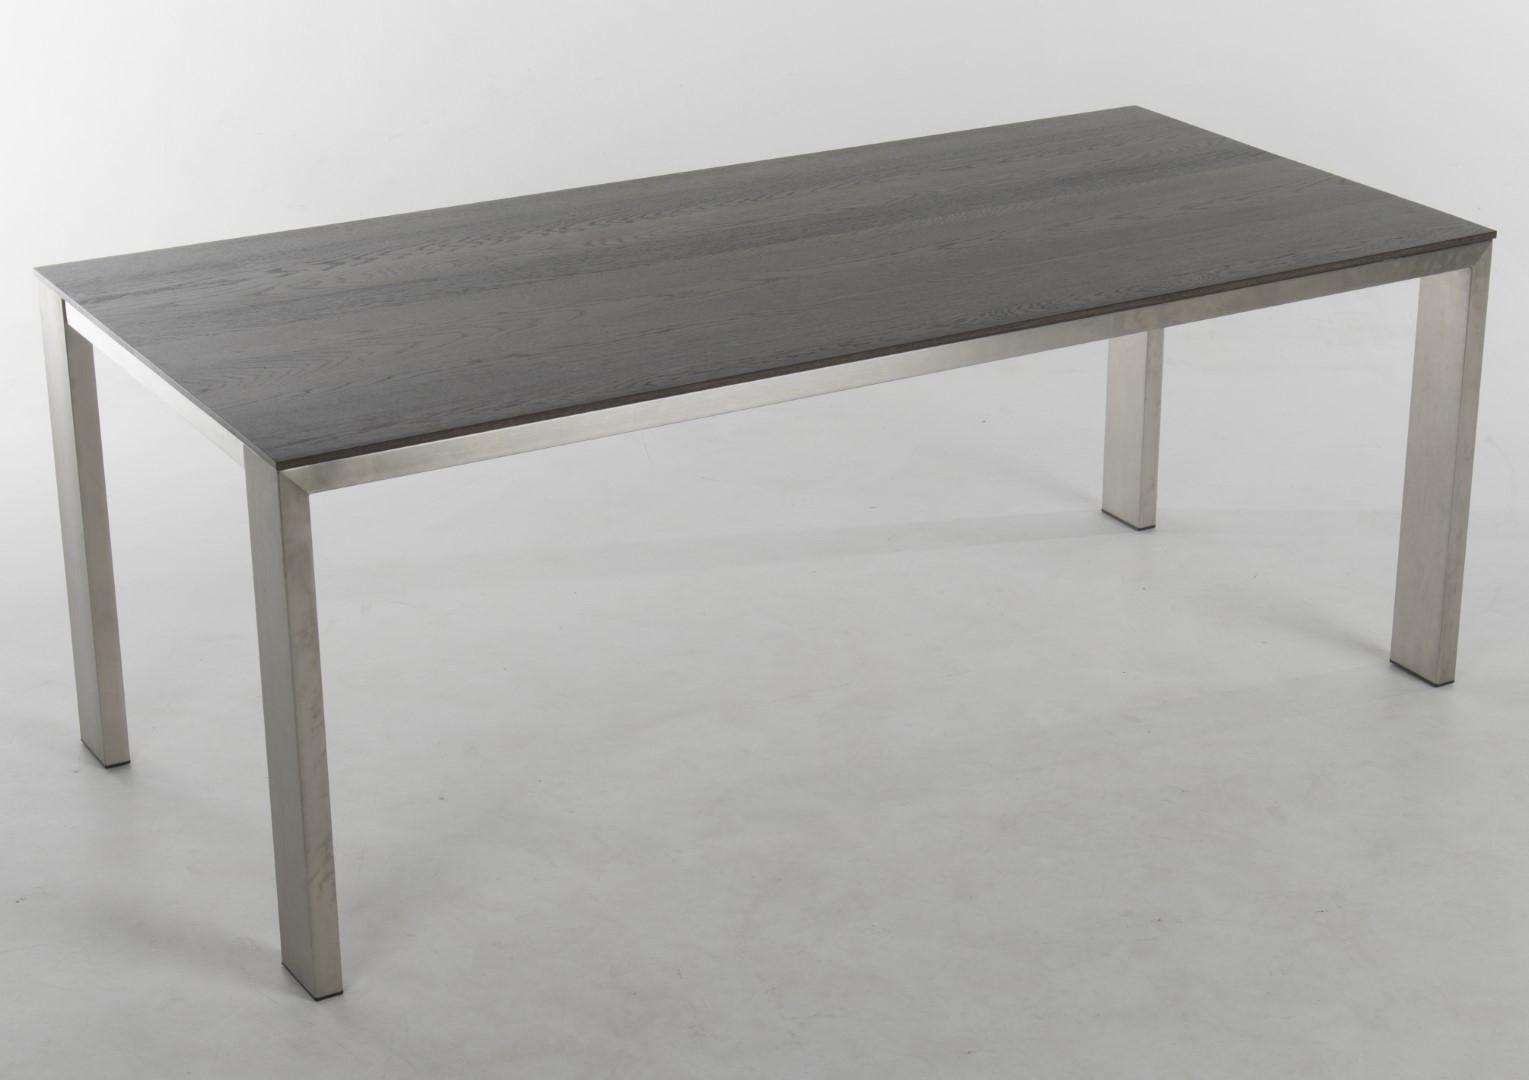 edge eettafel bert plantagie outlet. Black Bedroom Furniture Sets. Home Design Ideas